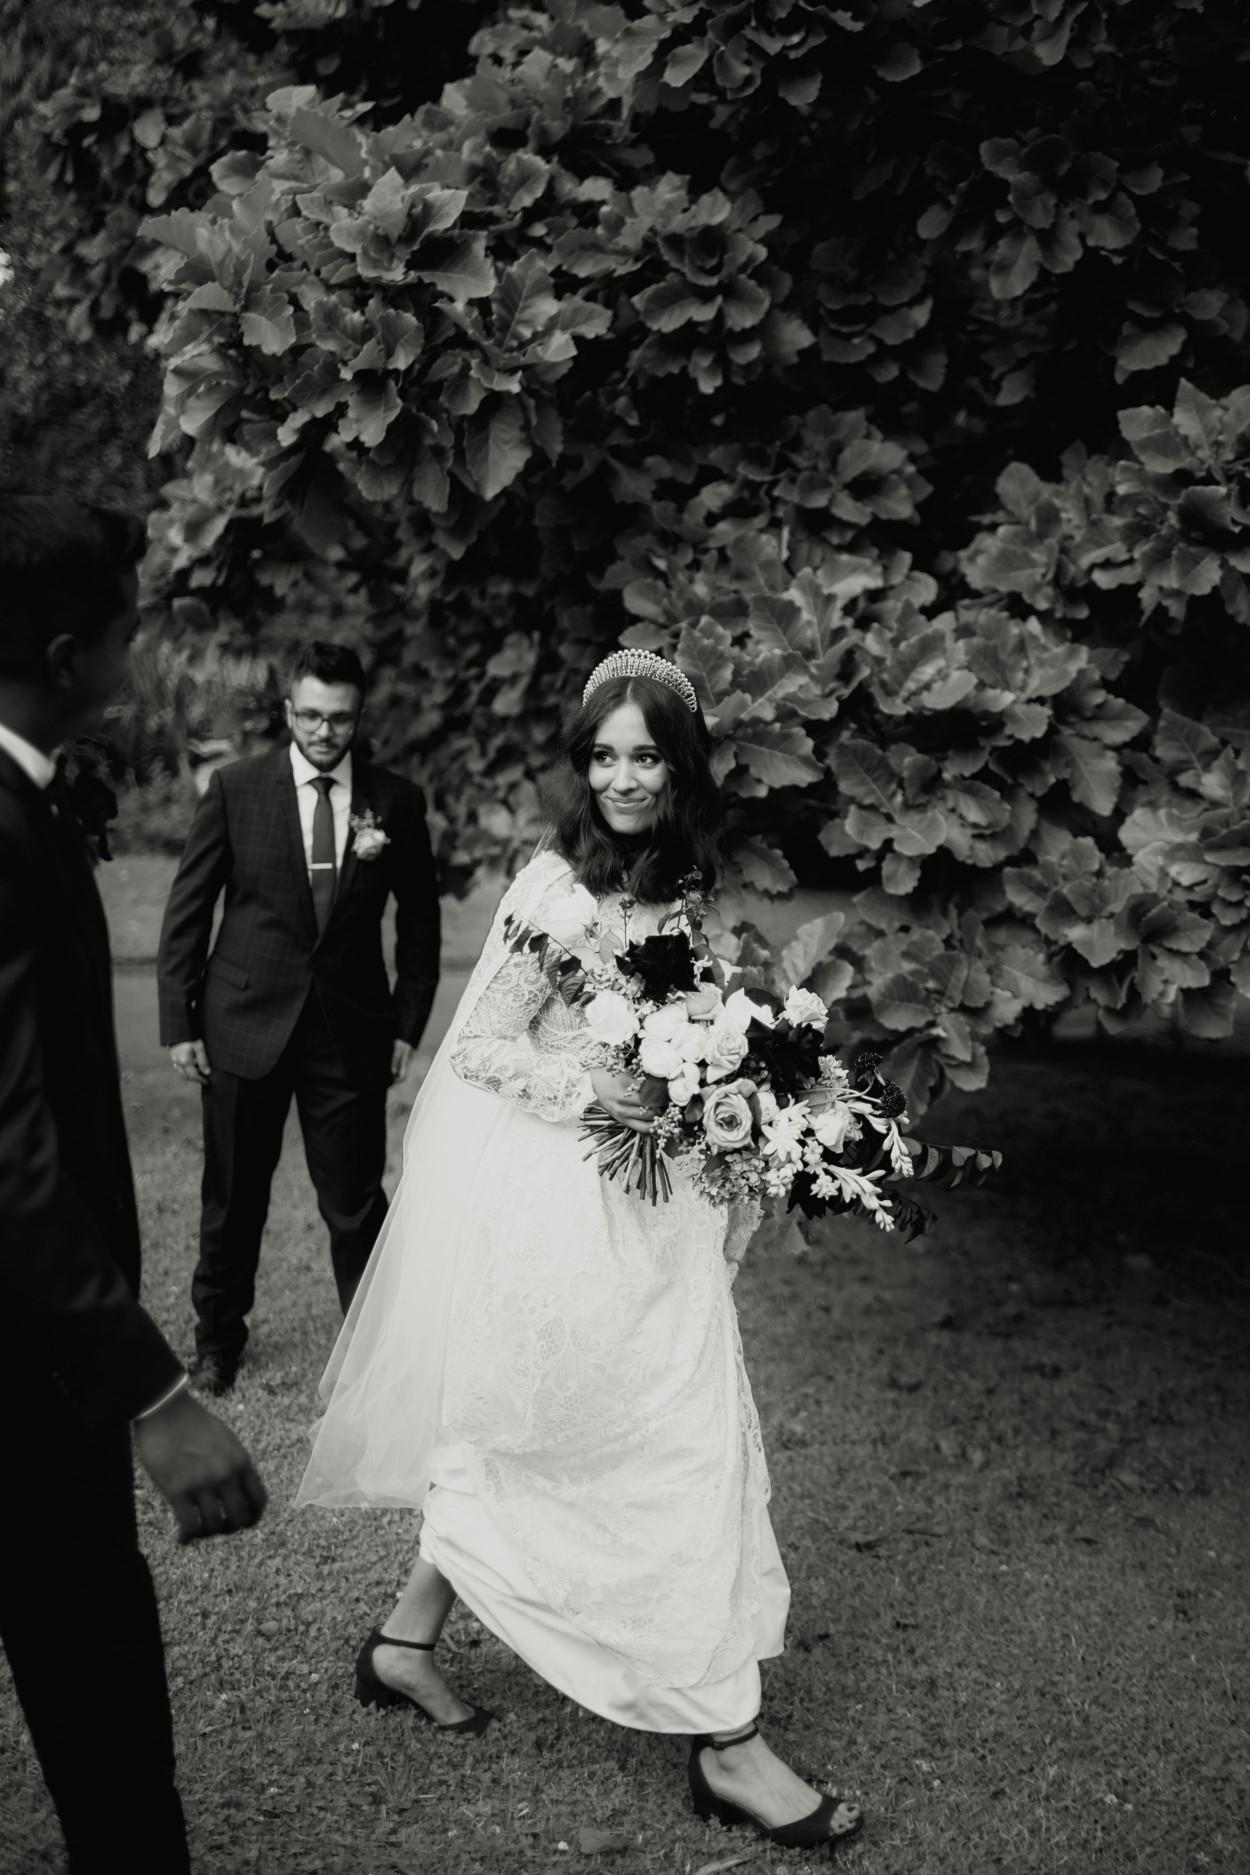 I-Got-You-Babe-Weddings-The-063George-Ballroom-St-Kilda-Wedding-Amy-Abhi.jpg